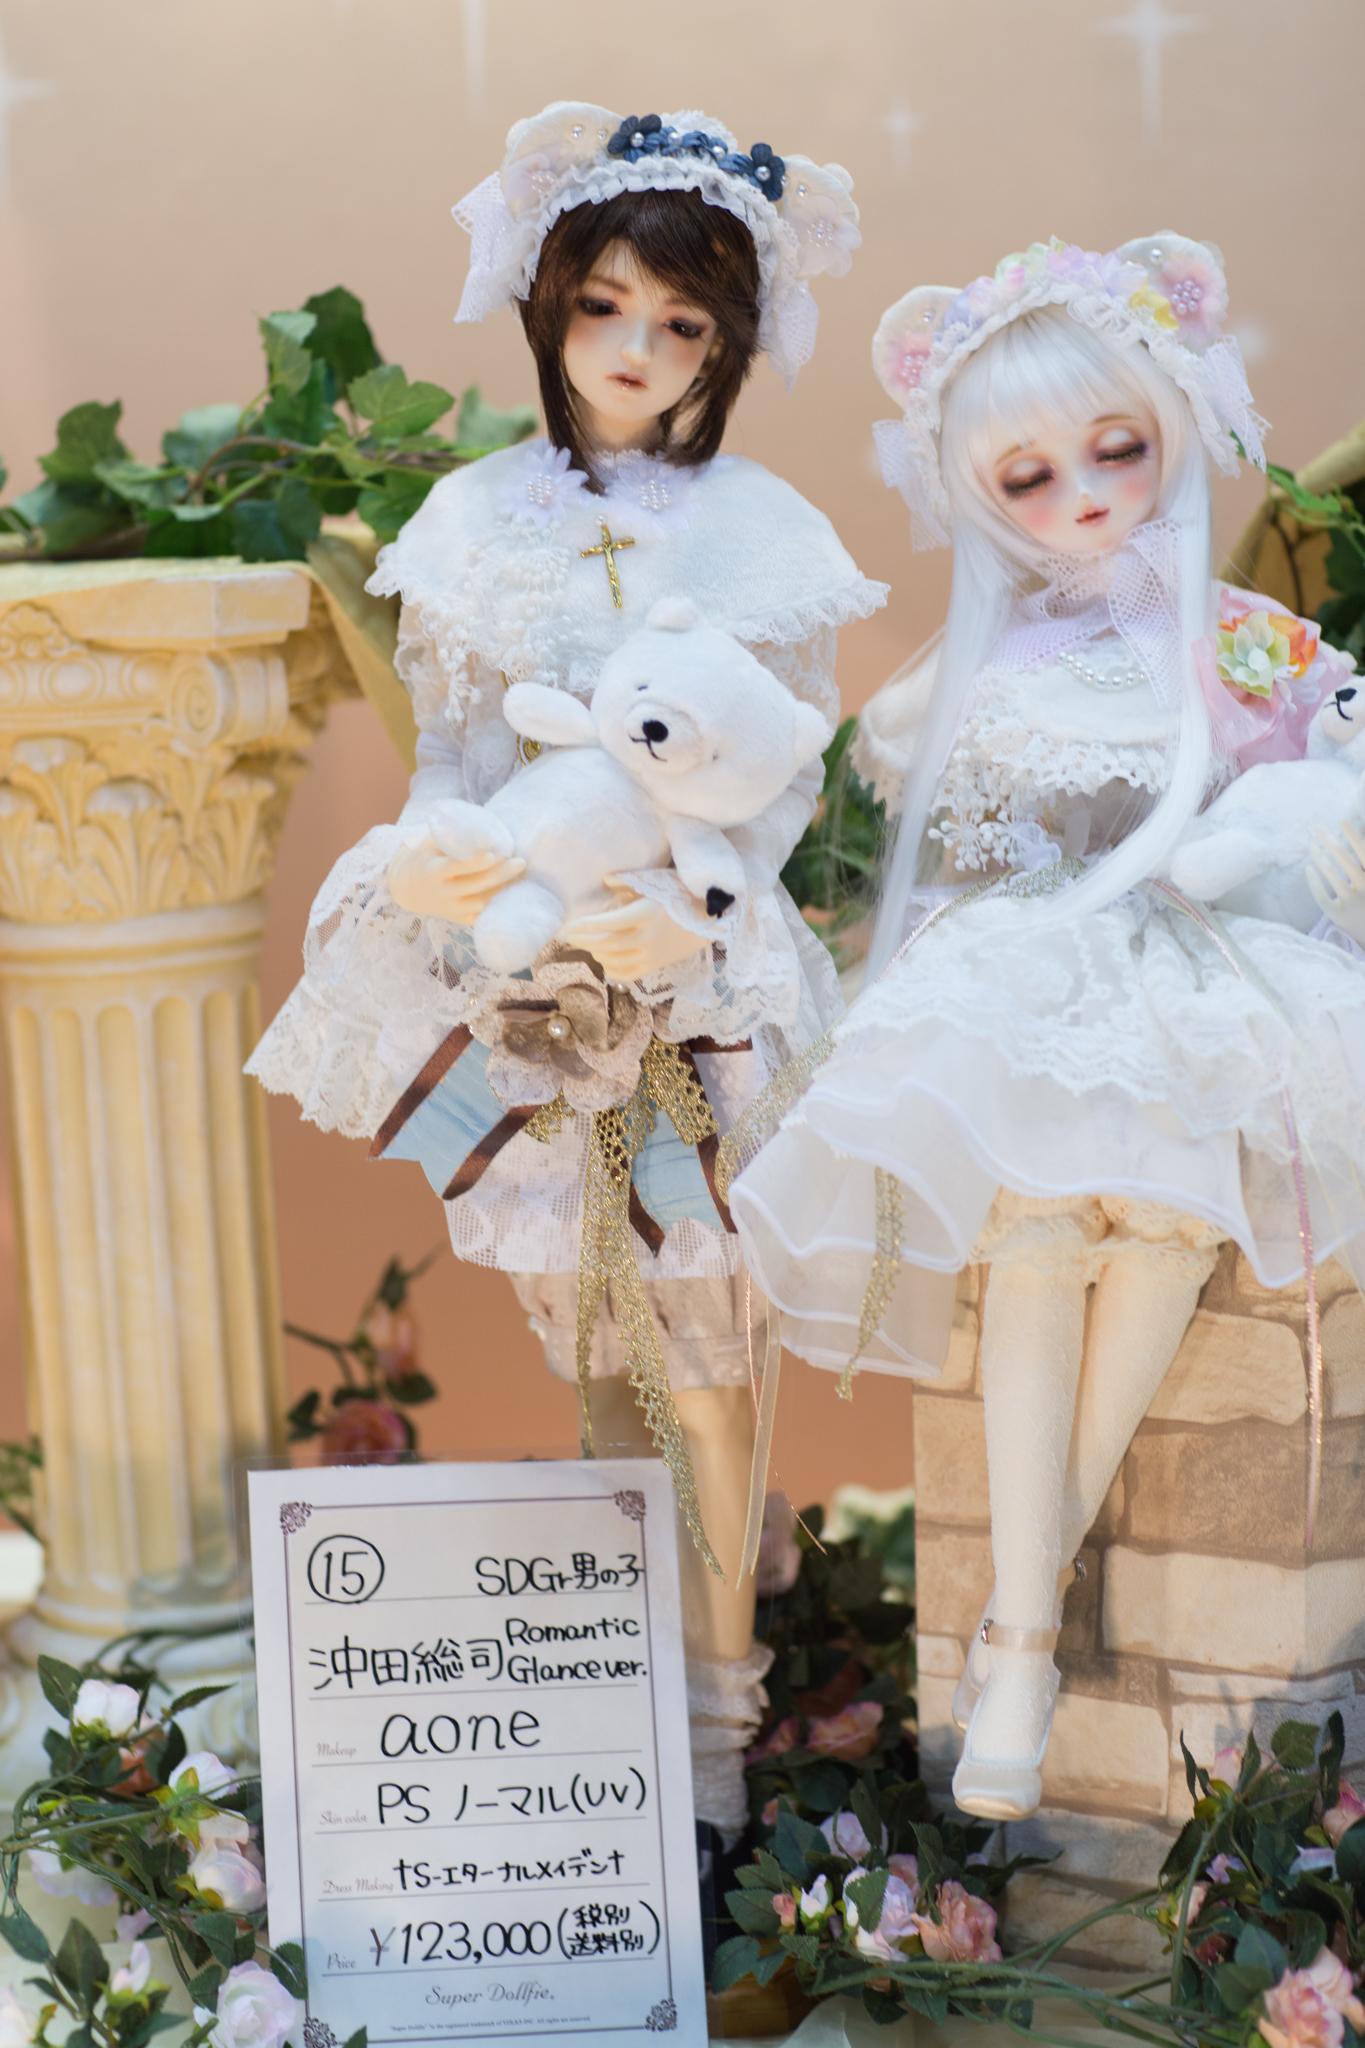 SDGr男の子 沖田総司 Romantic Glance Ver.